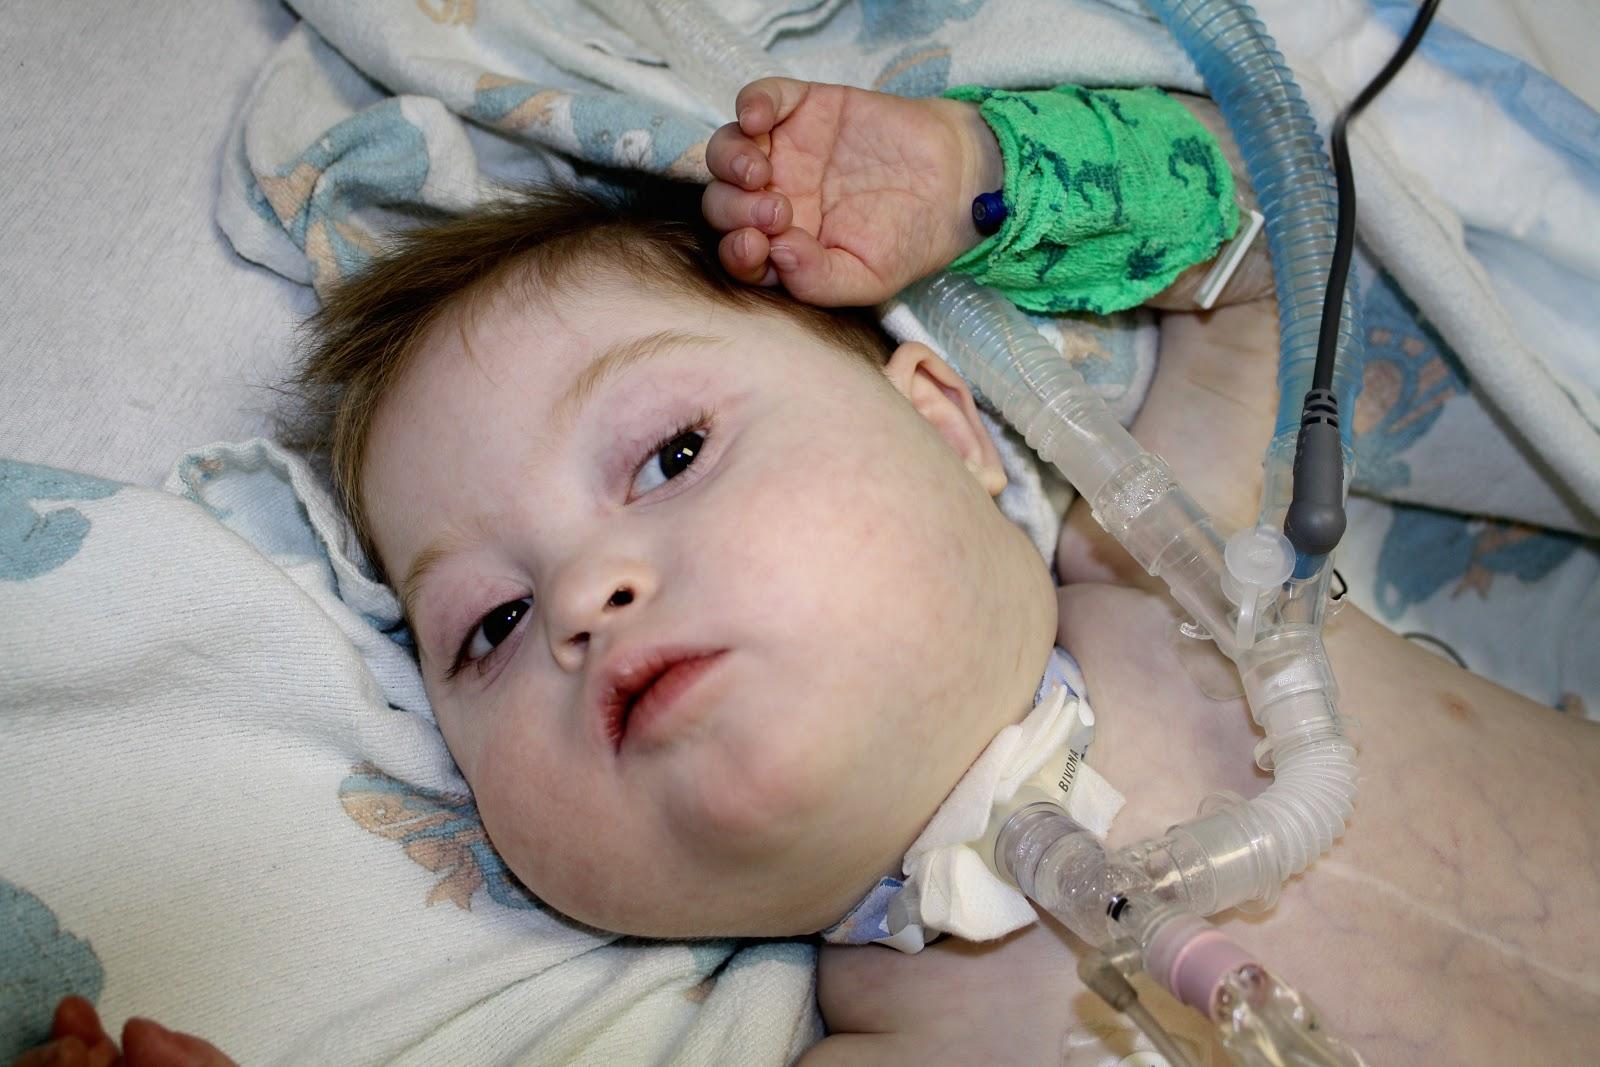 Ventilator Patient Trach The ventilator that someVentilator Patient Child